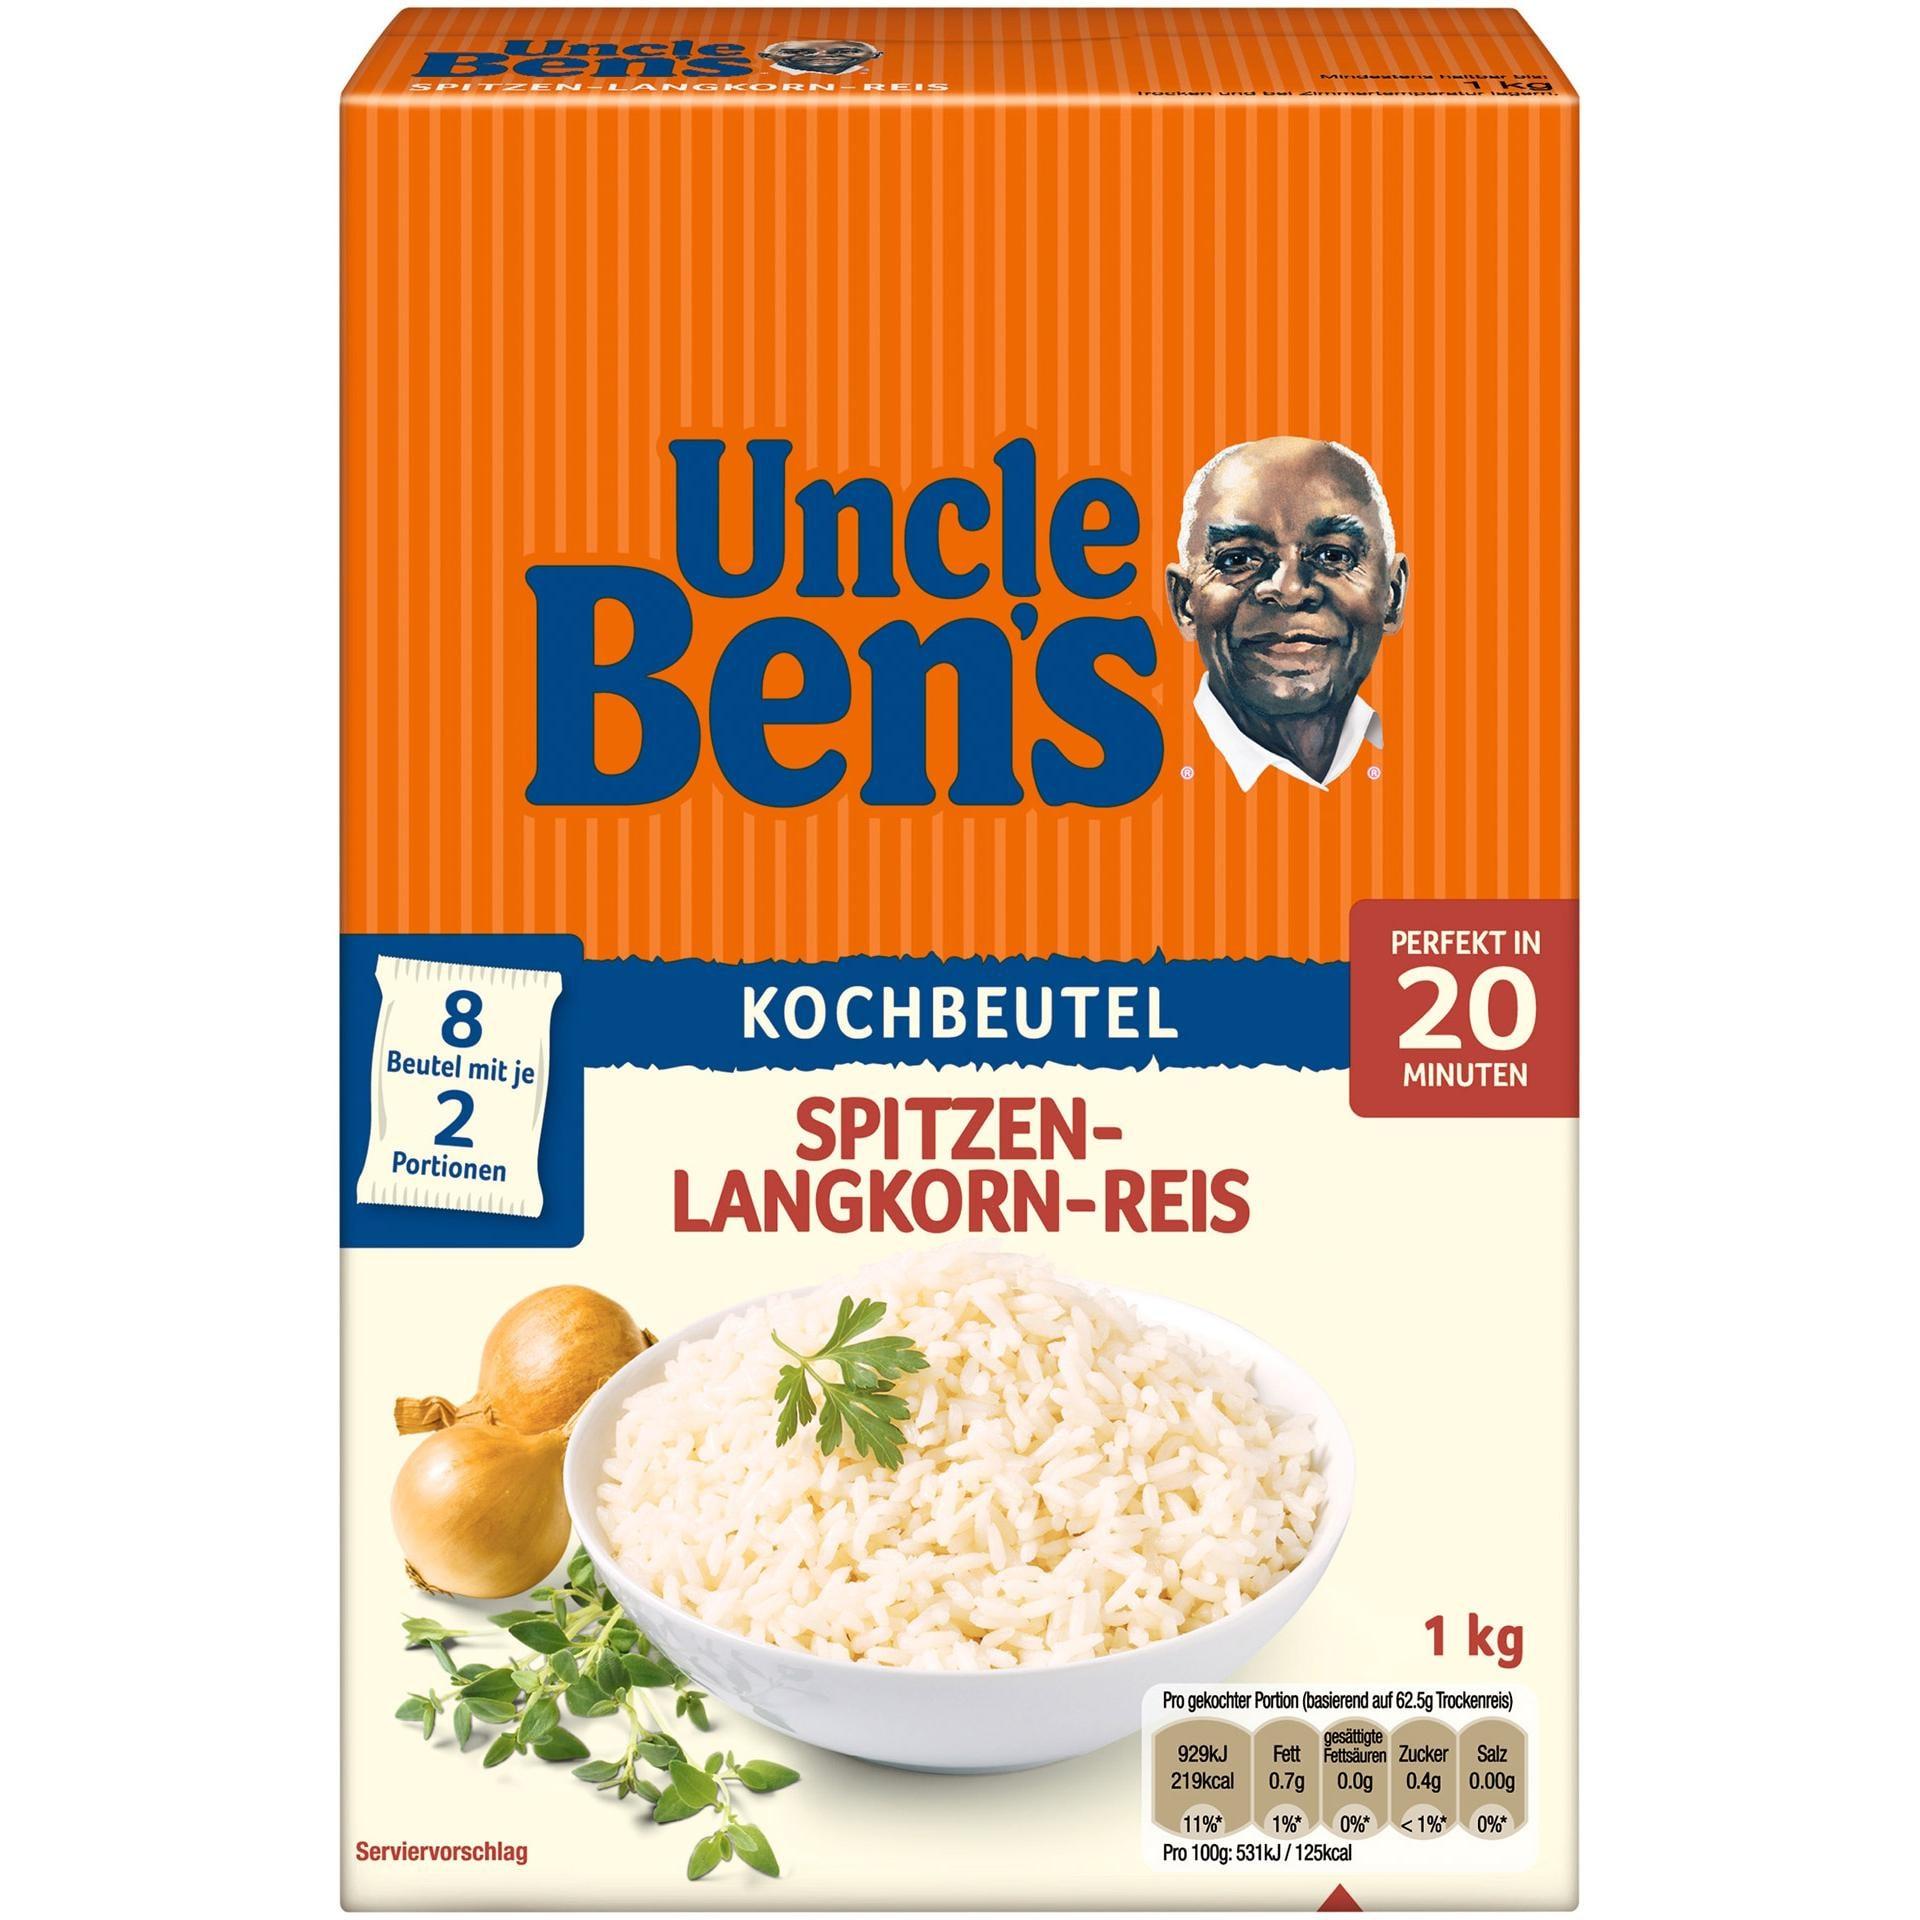 Uncle Bens - Spitzen Langkorn Reis acht Kochbeutel - 1kg